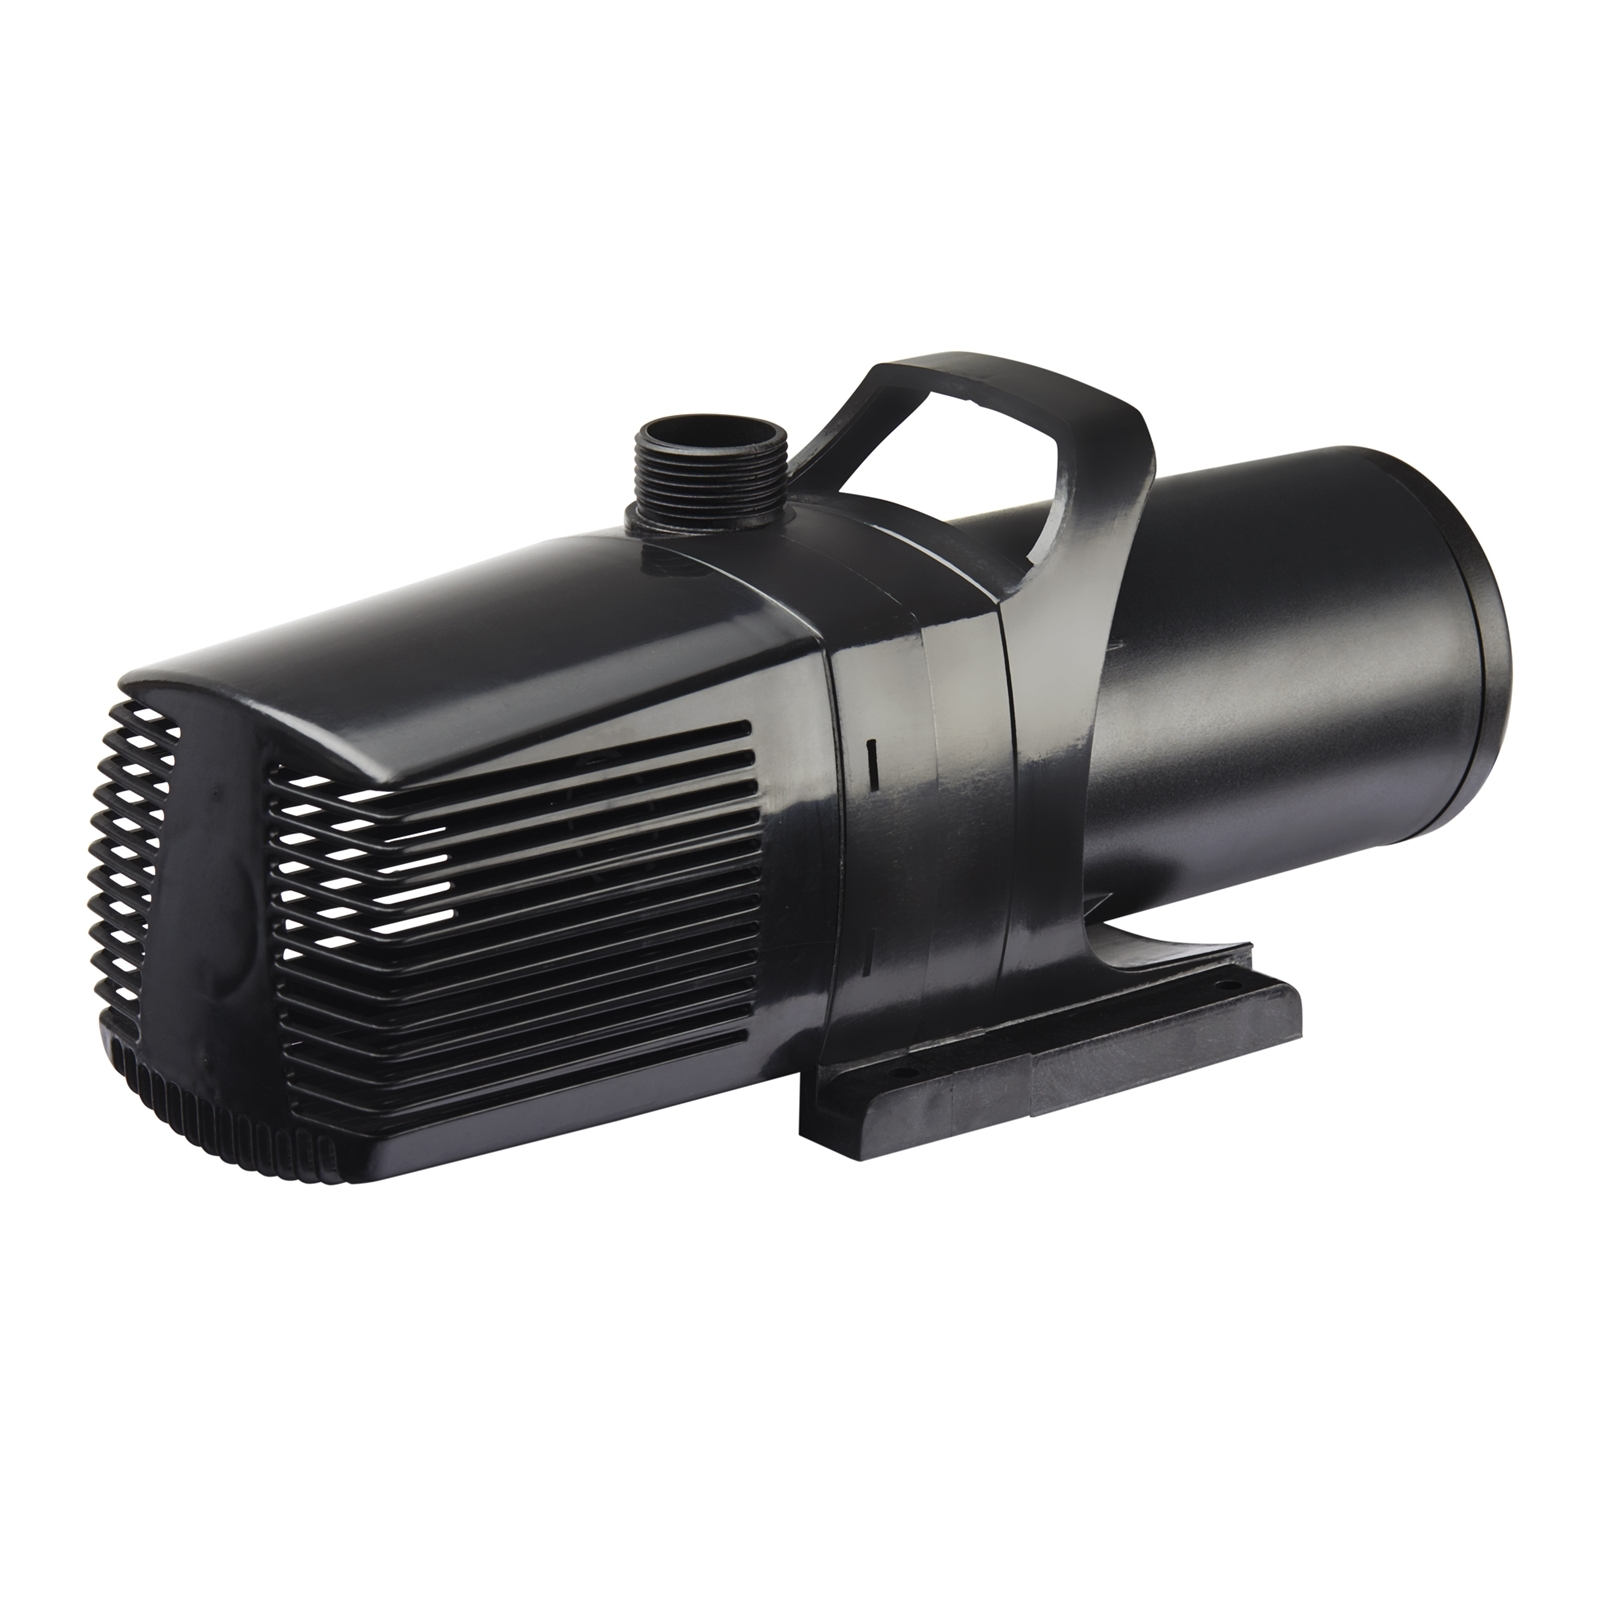 Aquapro AP7510HM Multi-Use Pond Pump